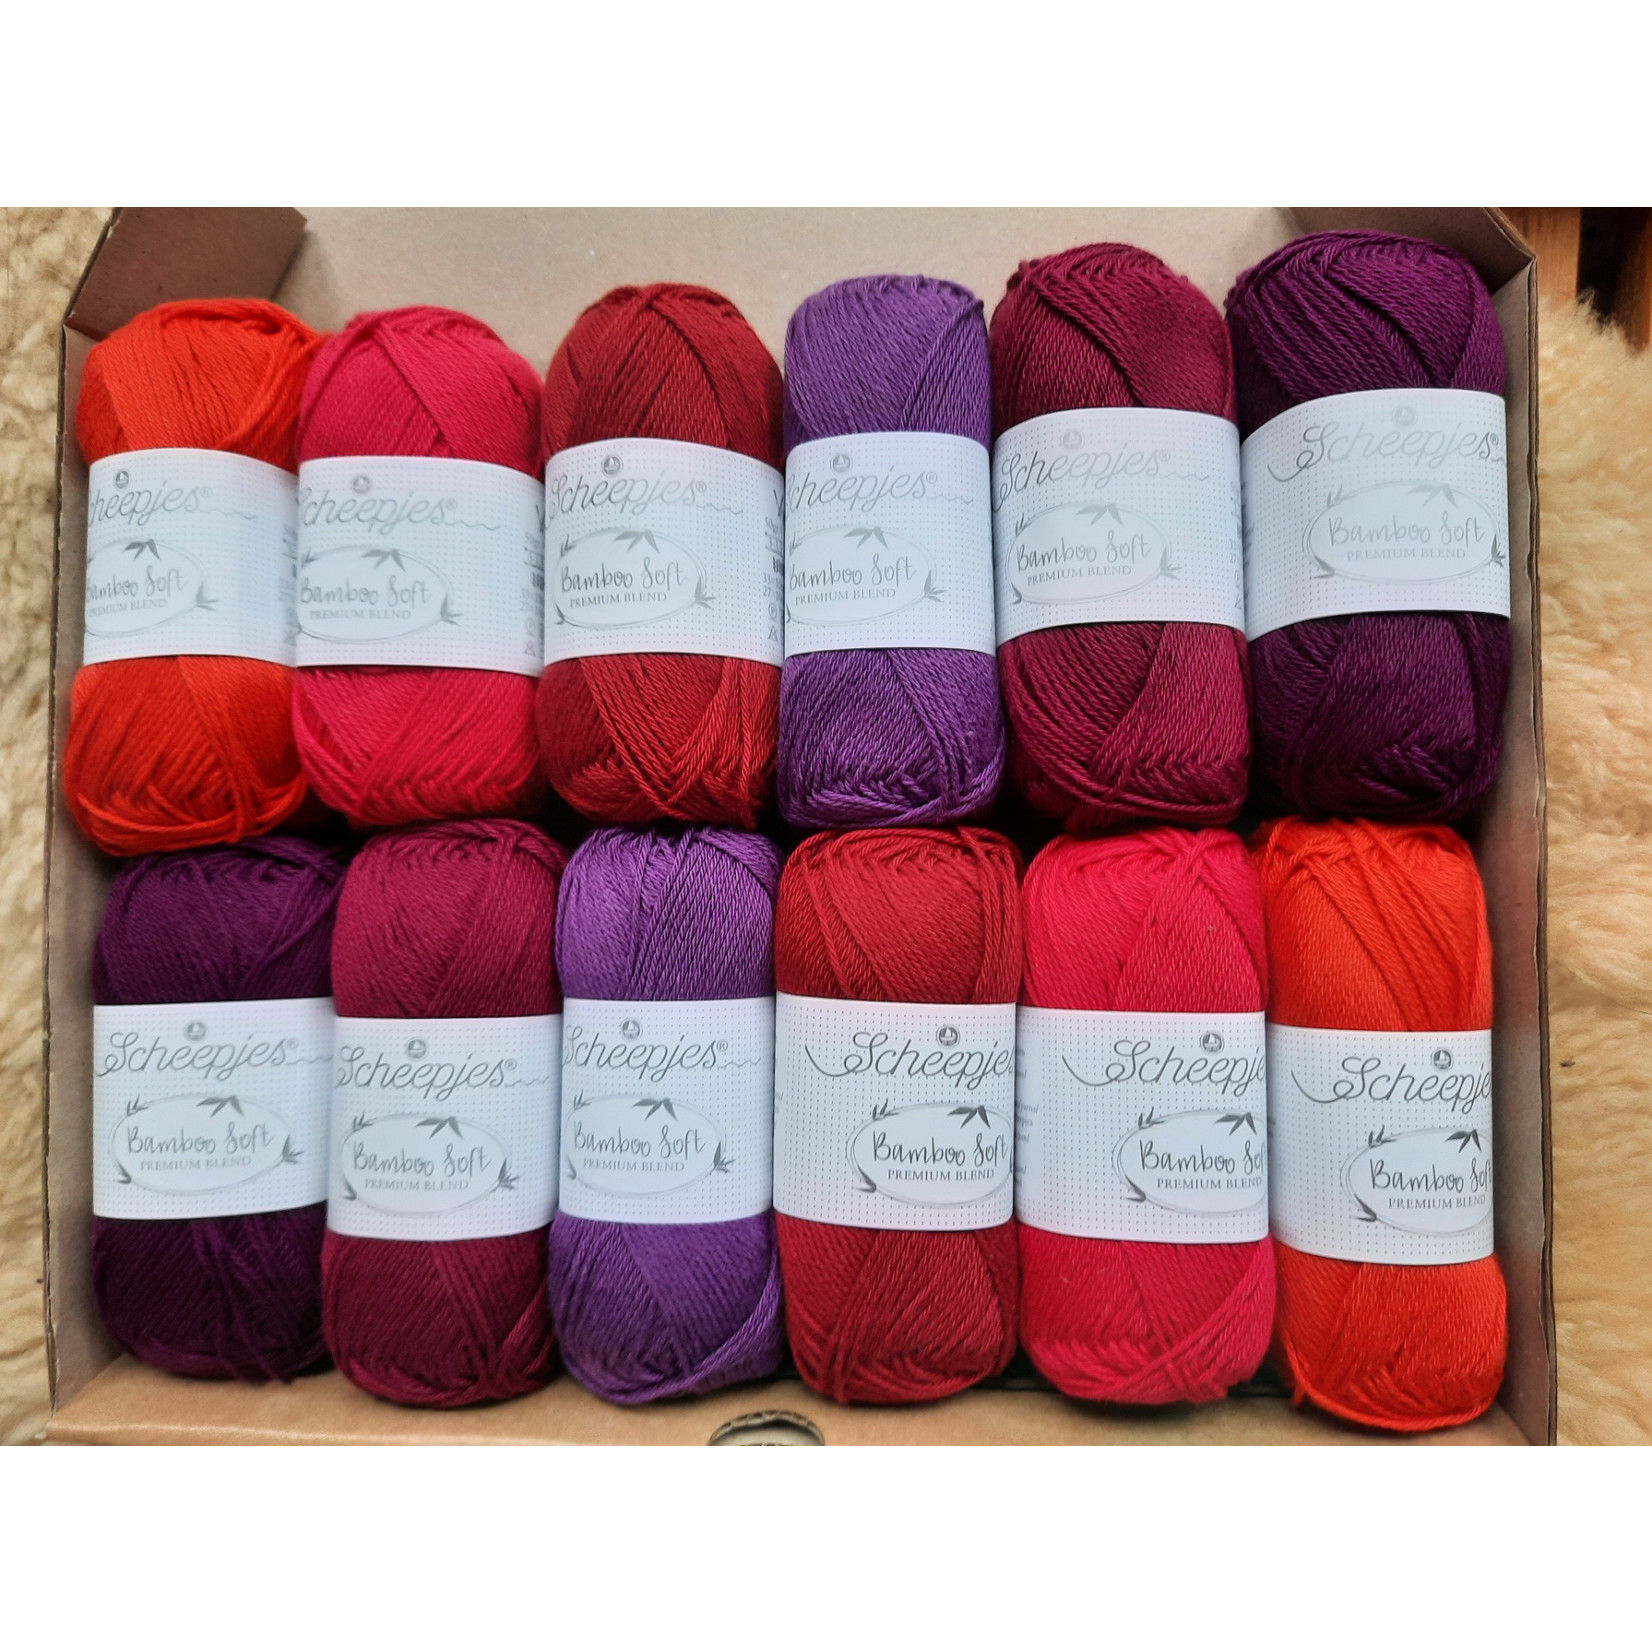 Scheepjes Scheepjes Bamboo Soft Assortiment Rood - 6 kleuren rood/paarstinten per 2 bollen van 50 gr. = 12 bollen